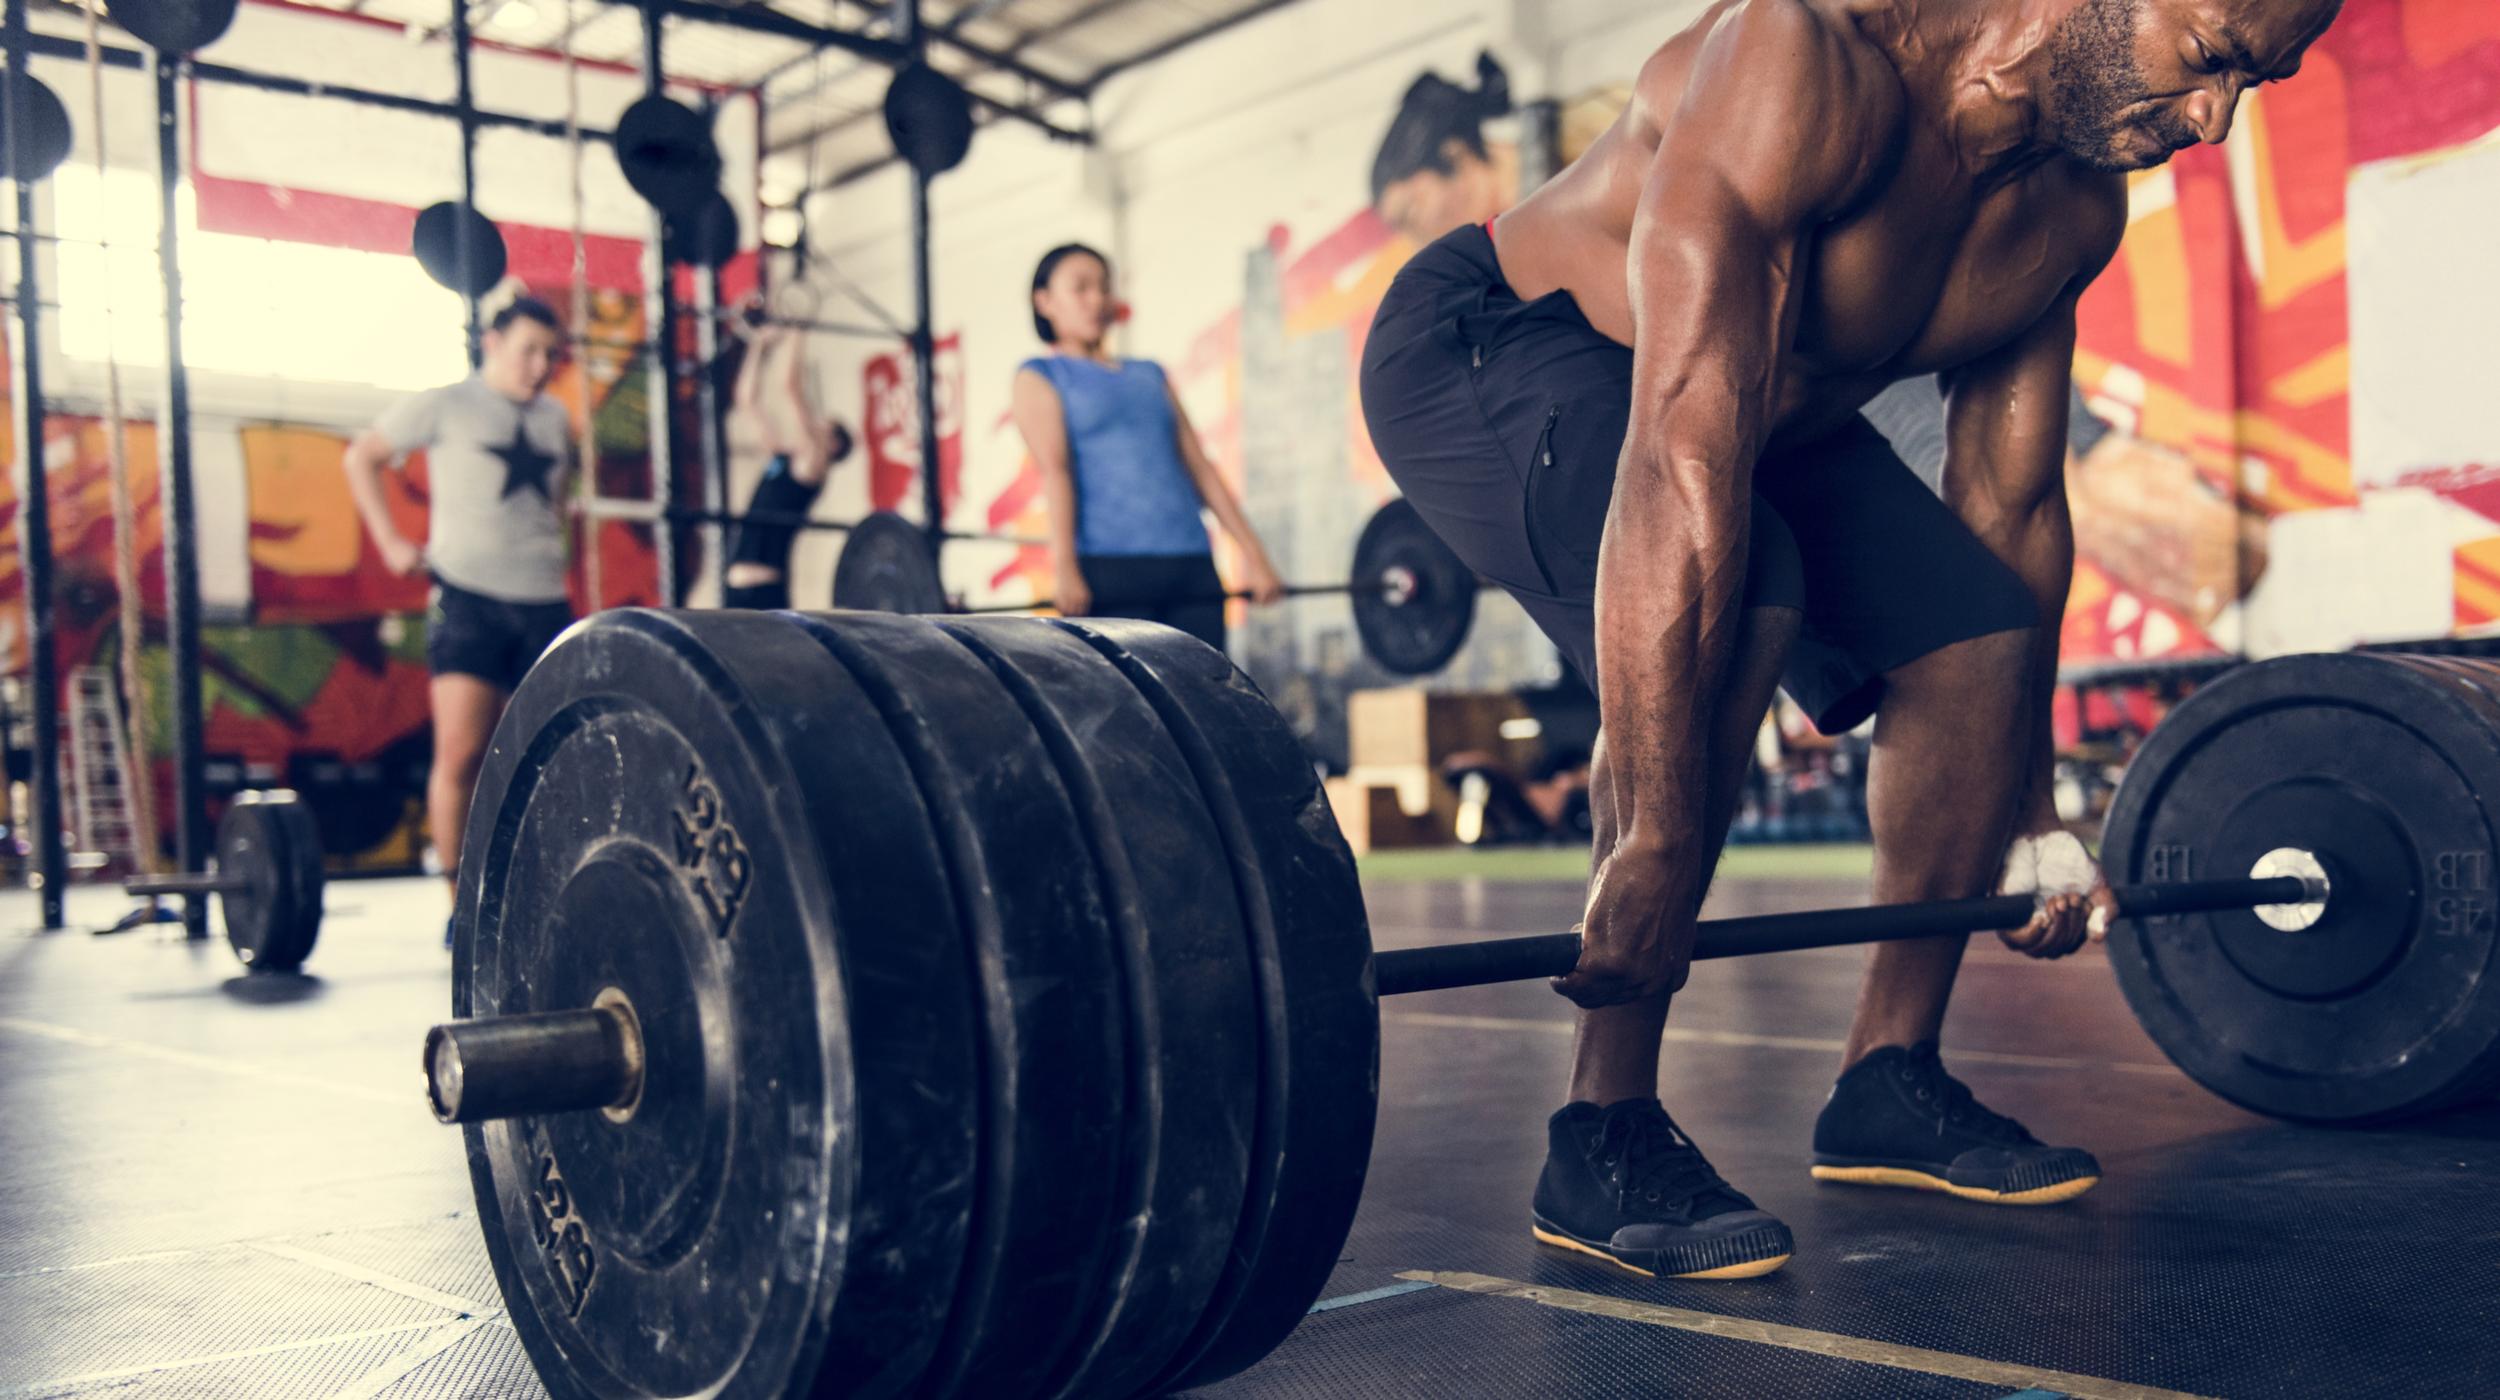 4 Surprising Benefits of Resistance Training